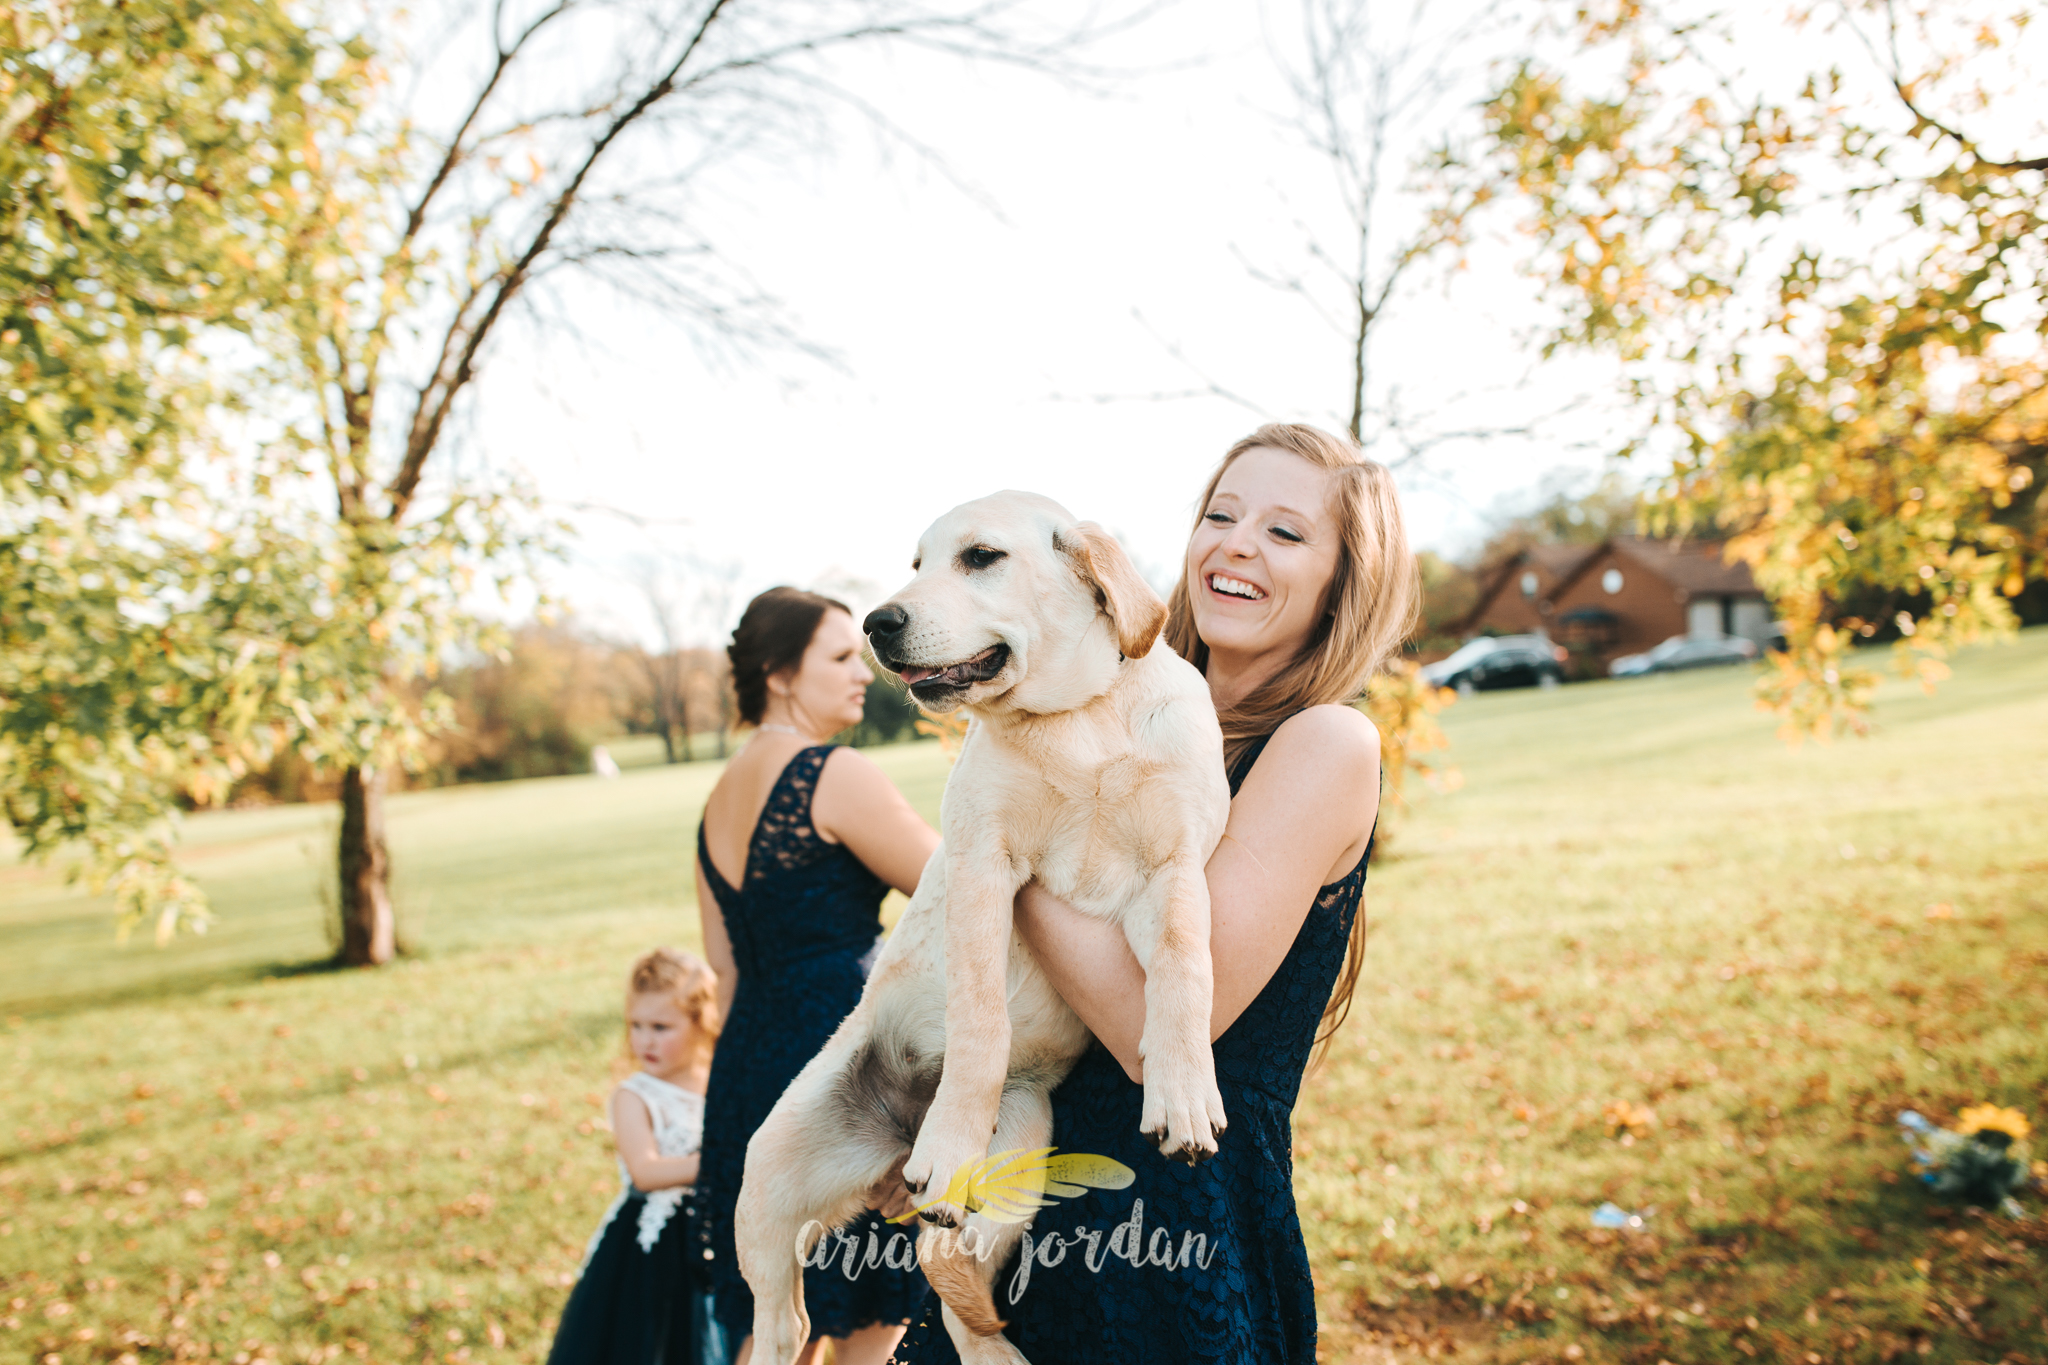 0060 Ariana Jordan Photography - Georgetown KY Wedding Photographer 8427.jpg